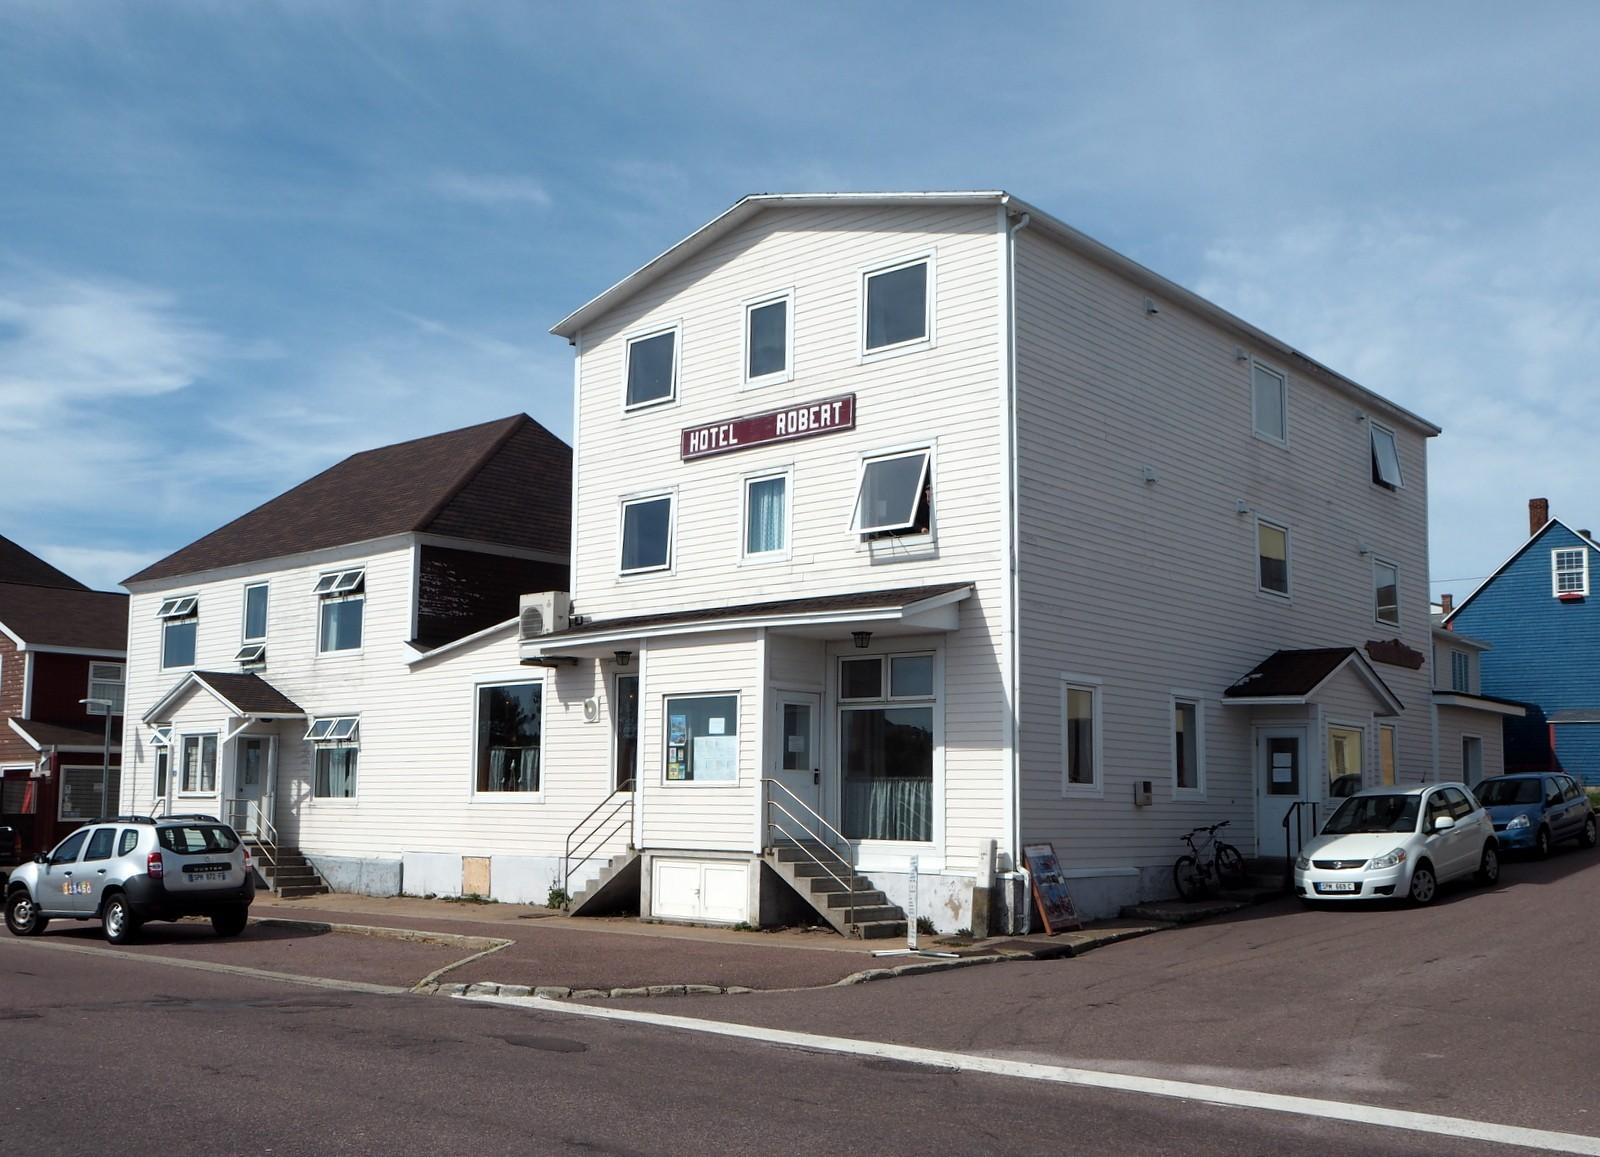 Hotel Robert Saint-Pierre